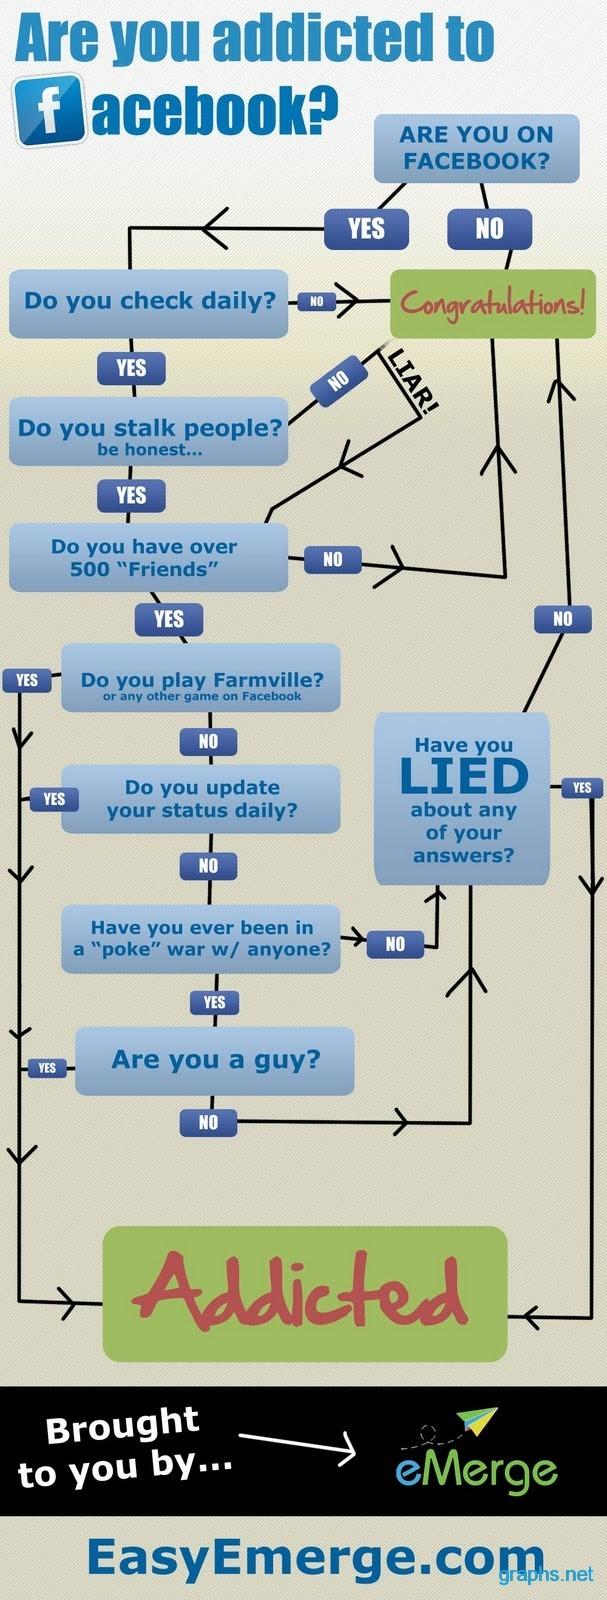 Steps to Determine Facebook Addiction